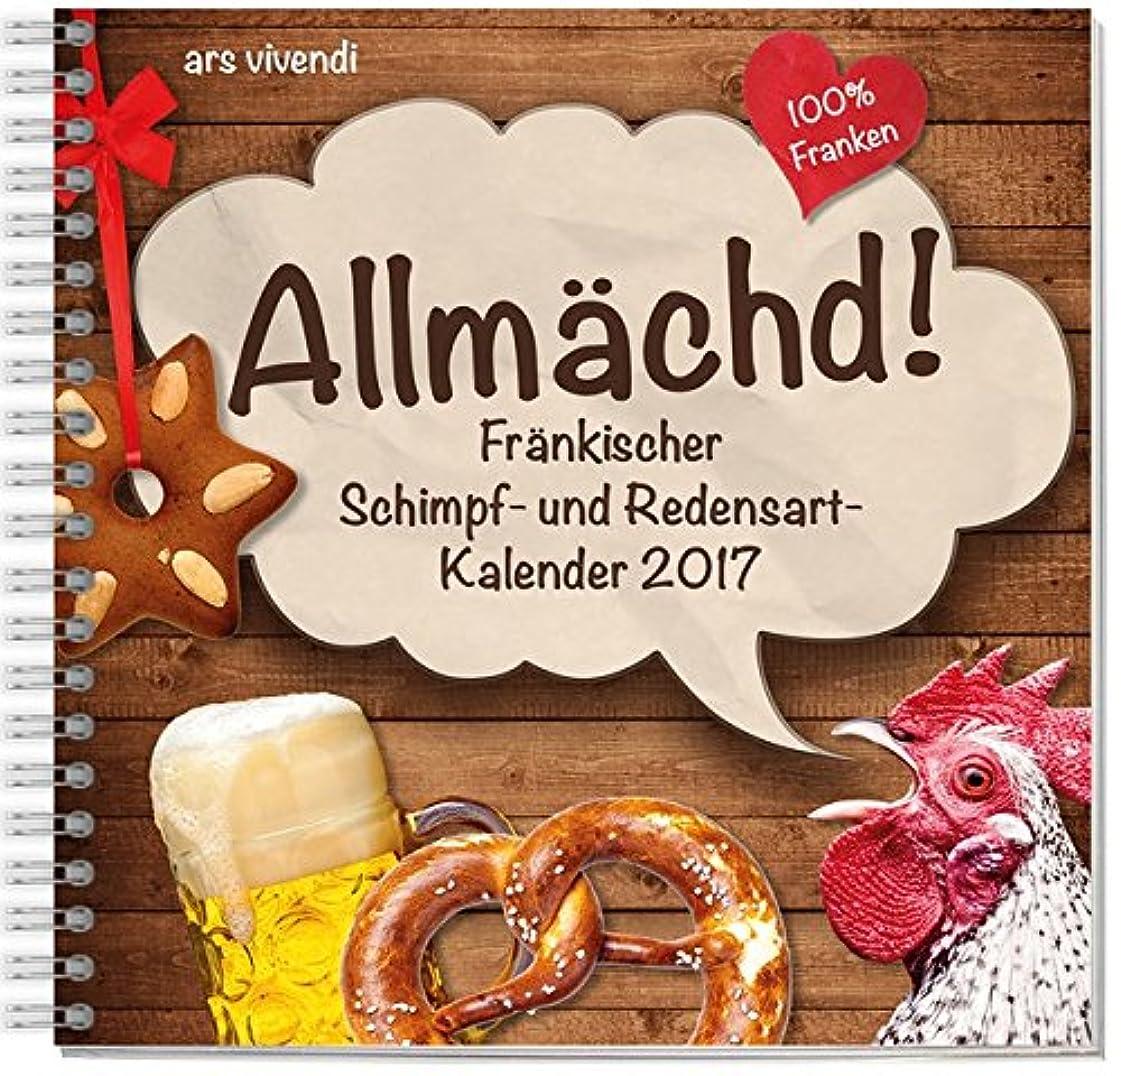 現れる階層地獄Allmaechd-Kalender 2017: Fraenkischer Schimpf- und Redensart-Kalender, Tischkalender